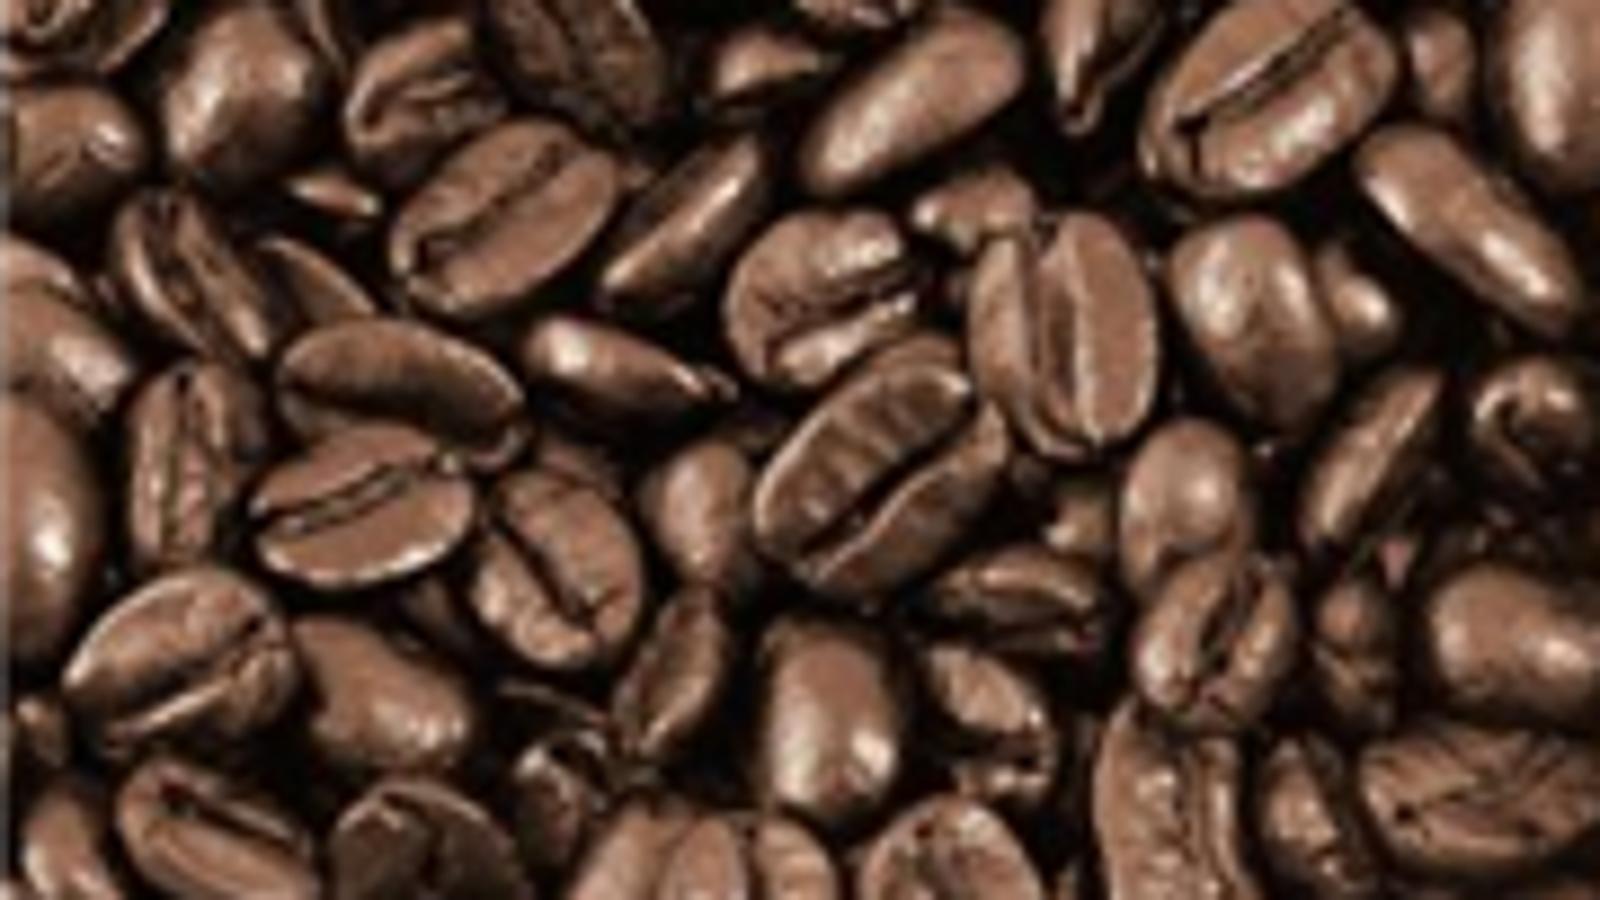 Want better tasting coffee? Try vinegar